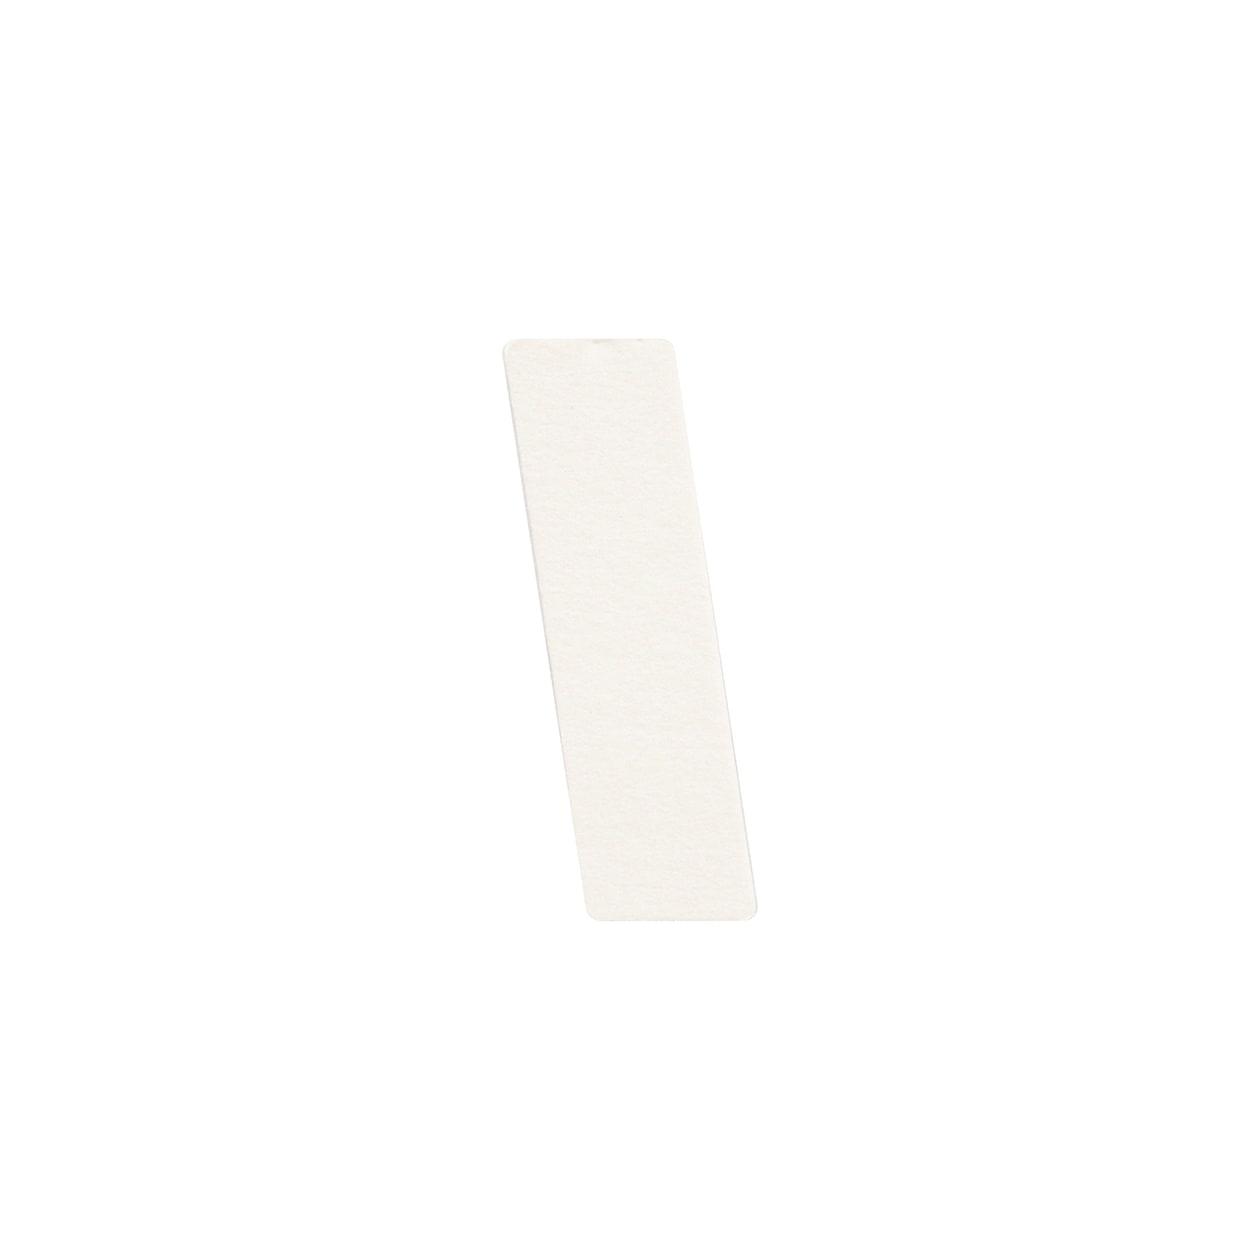 No.395ボード A7カードDC 文字I シルバー